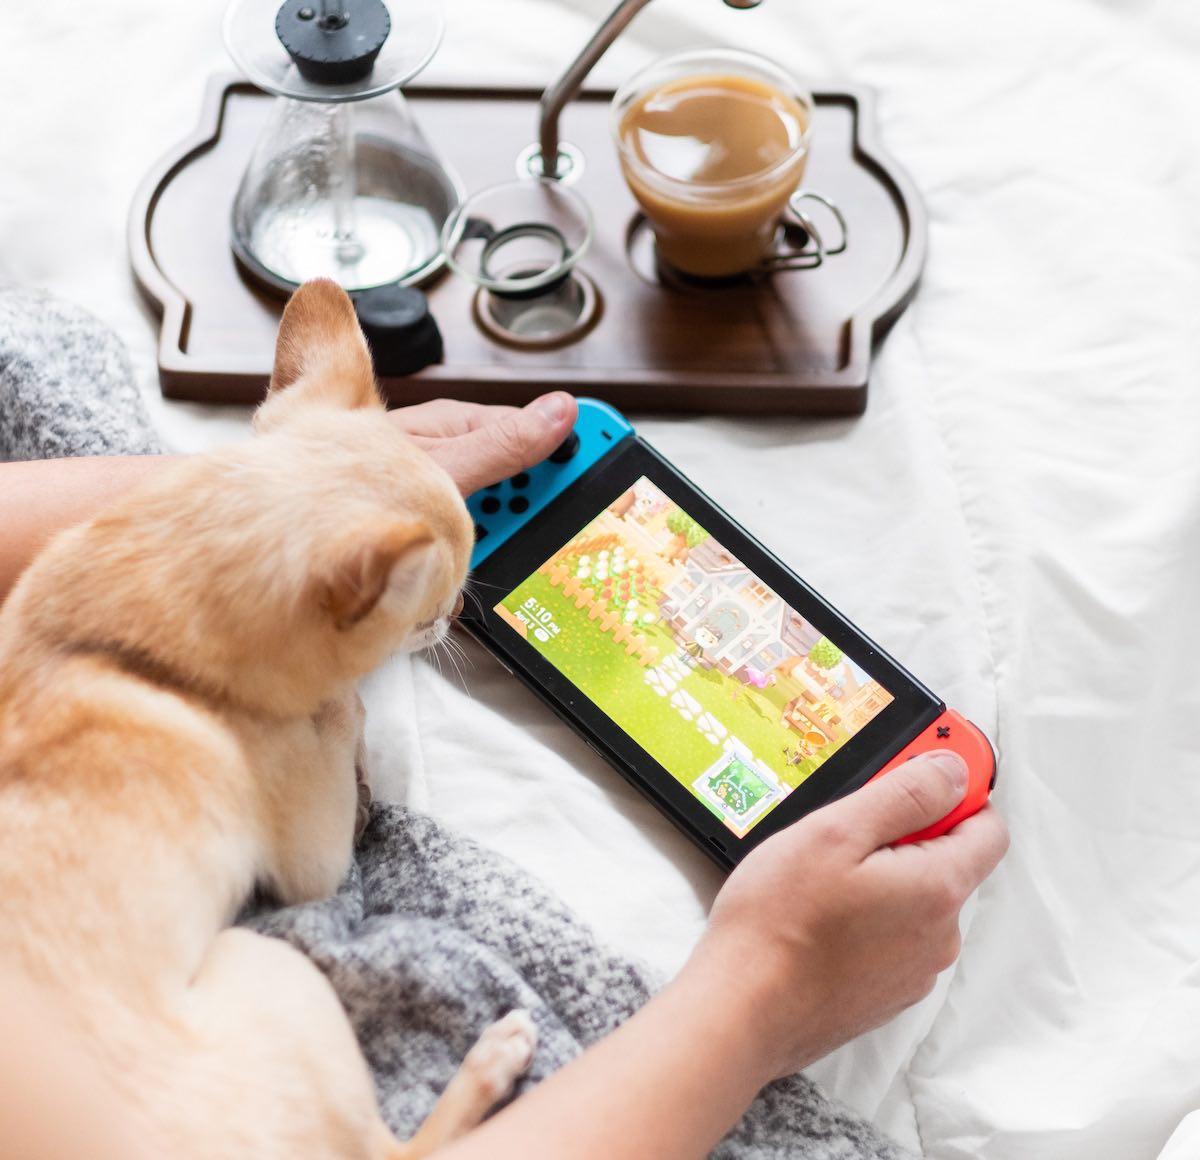 animal crossing self-care games